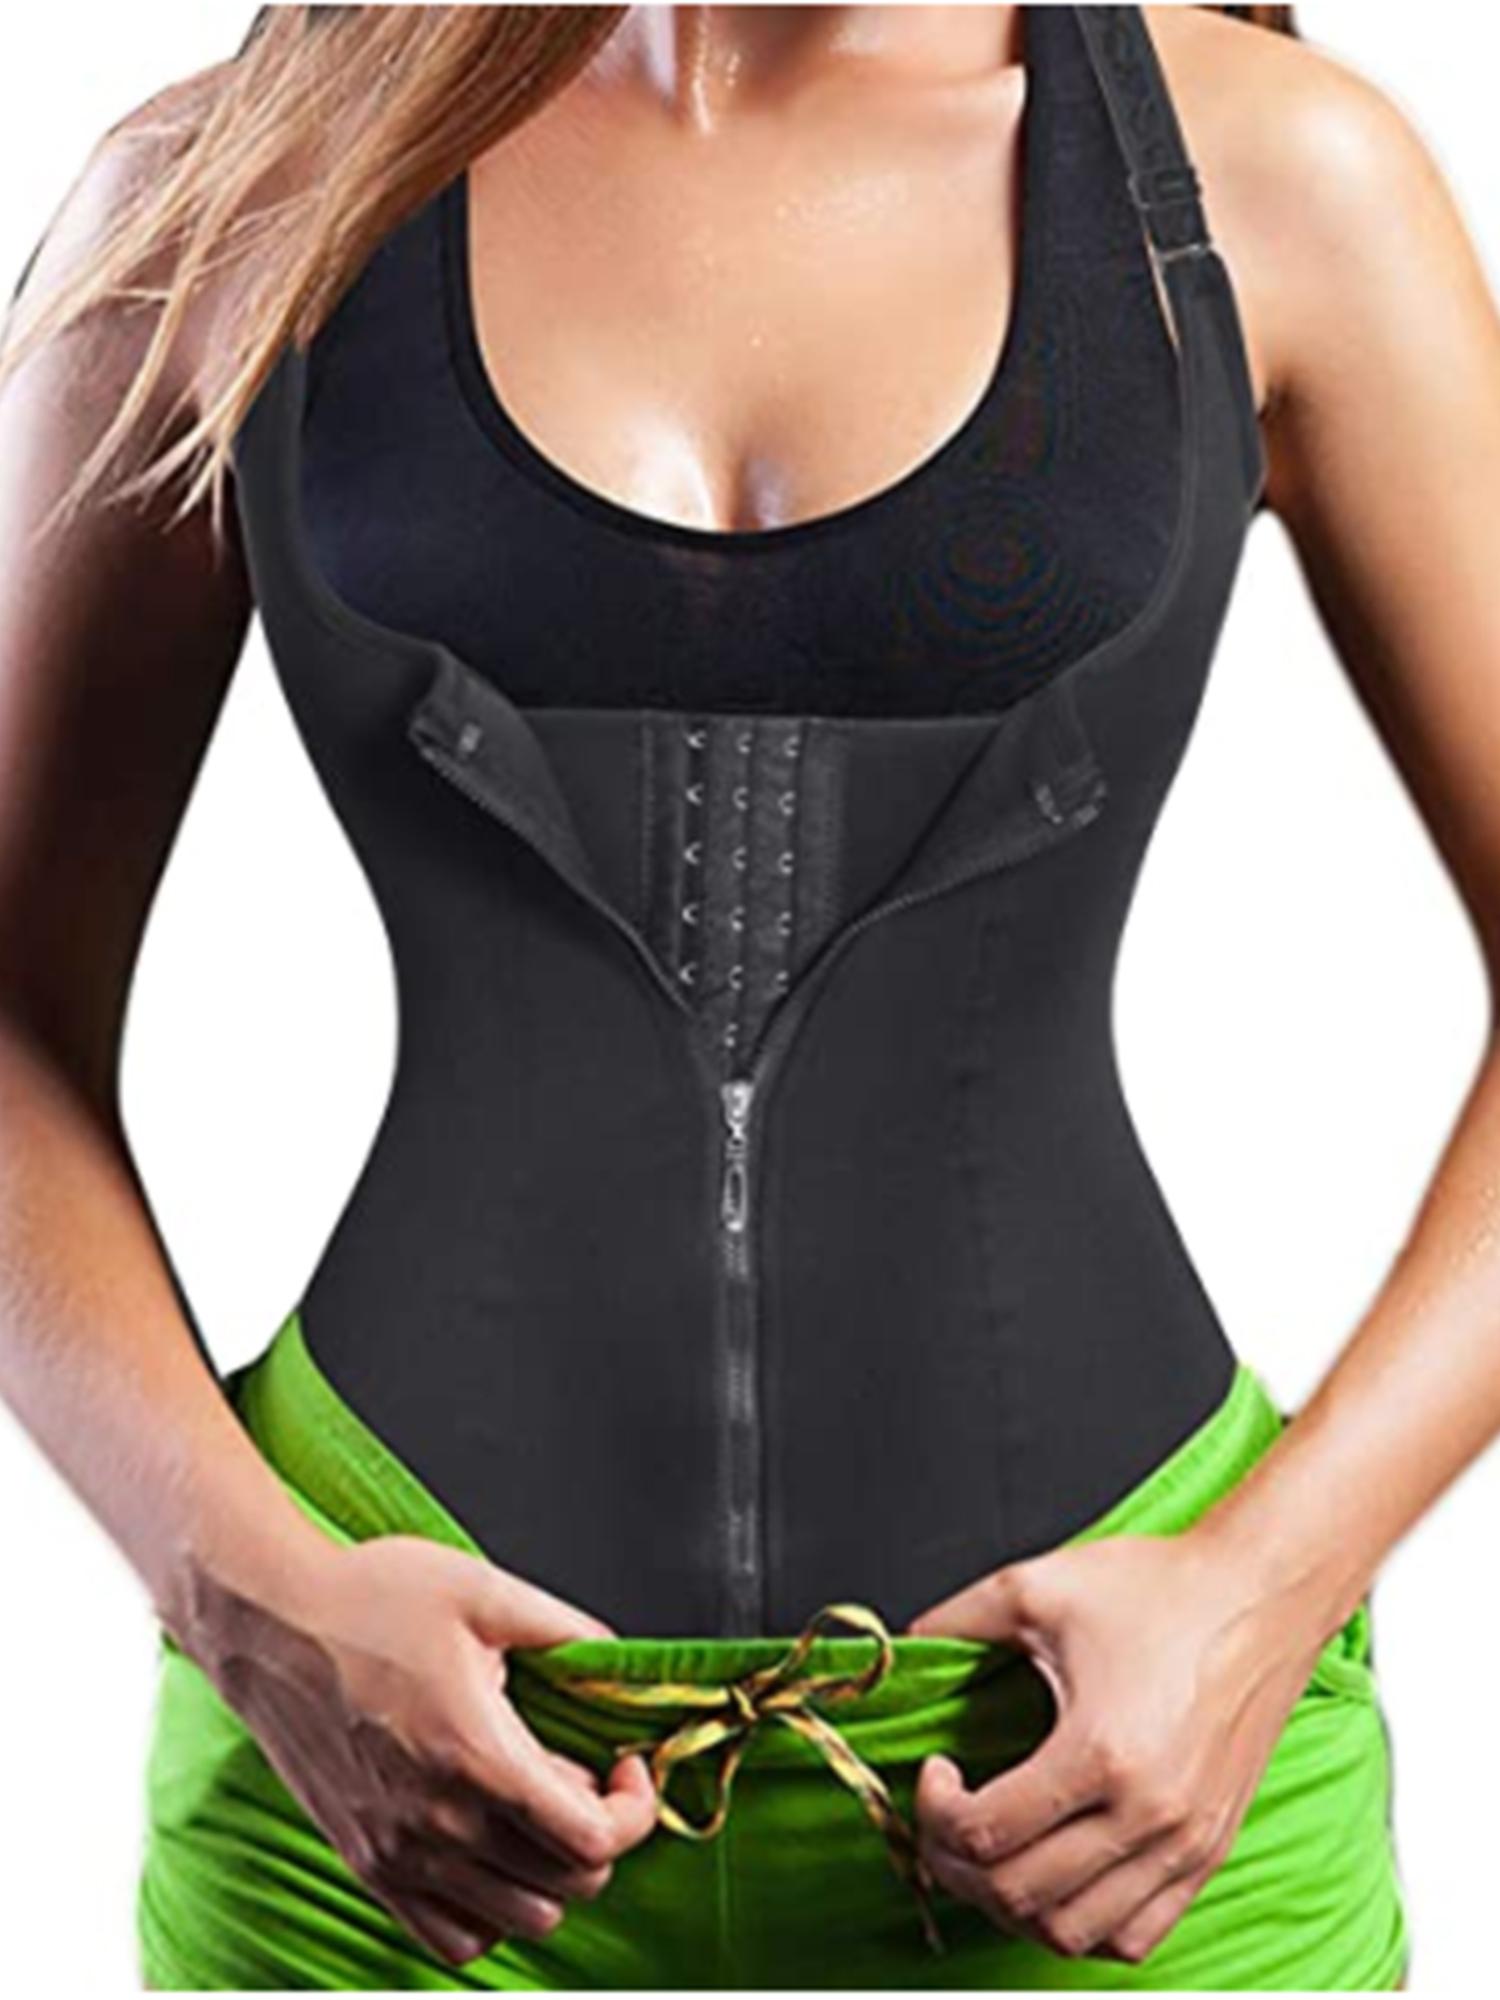 Waist Trainer Cincher Body Shaper Sweat Tummy Control Underbust Corset Vest Belt